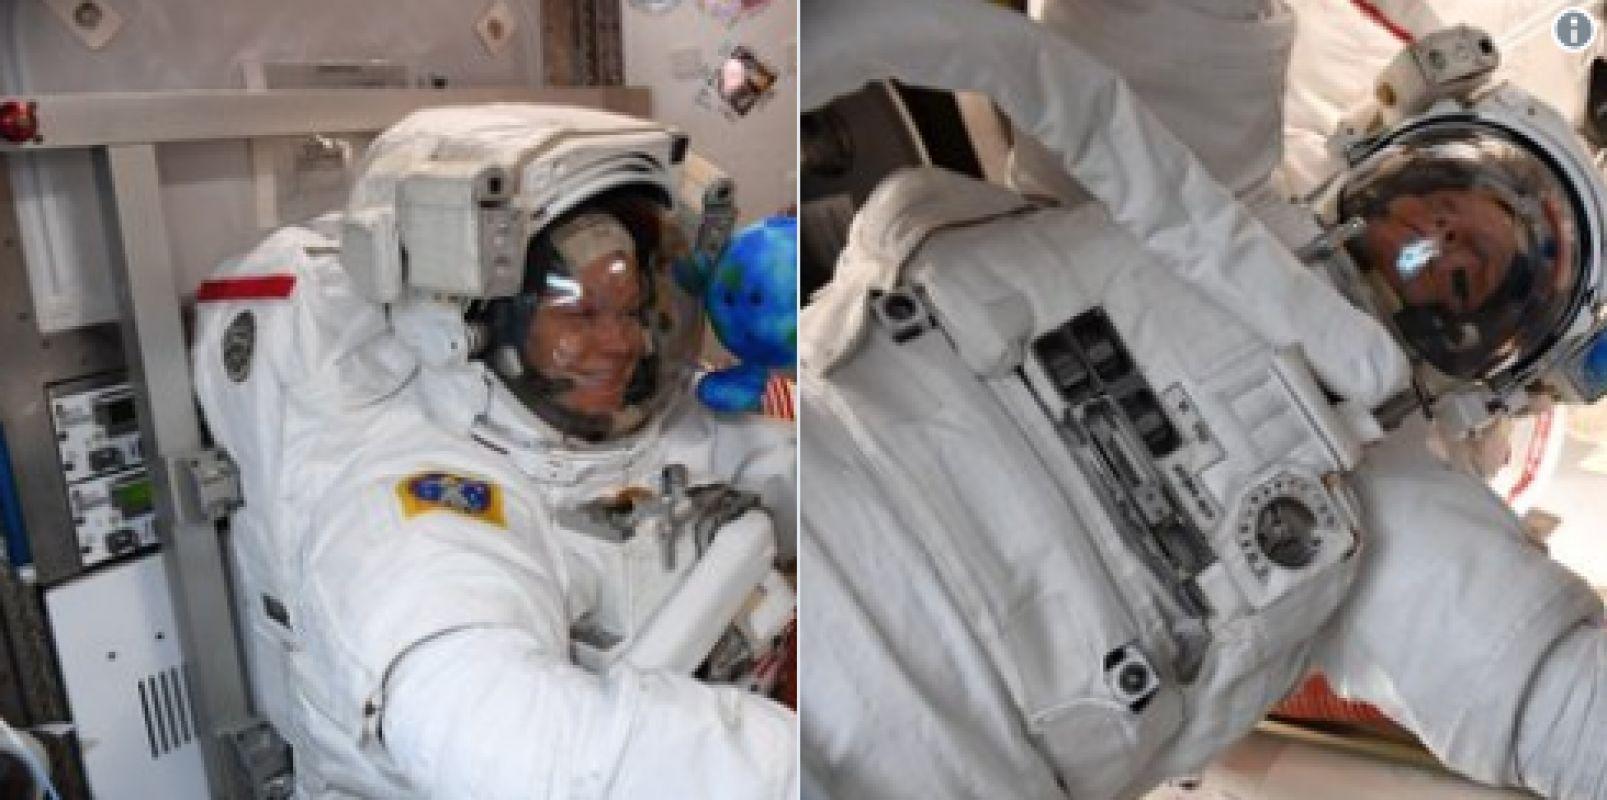 Американка Энн Макклейн за три месяца на МКС выросла на 5 сантиметров